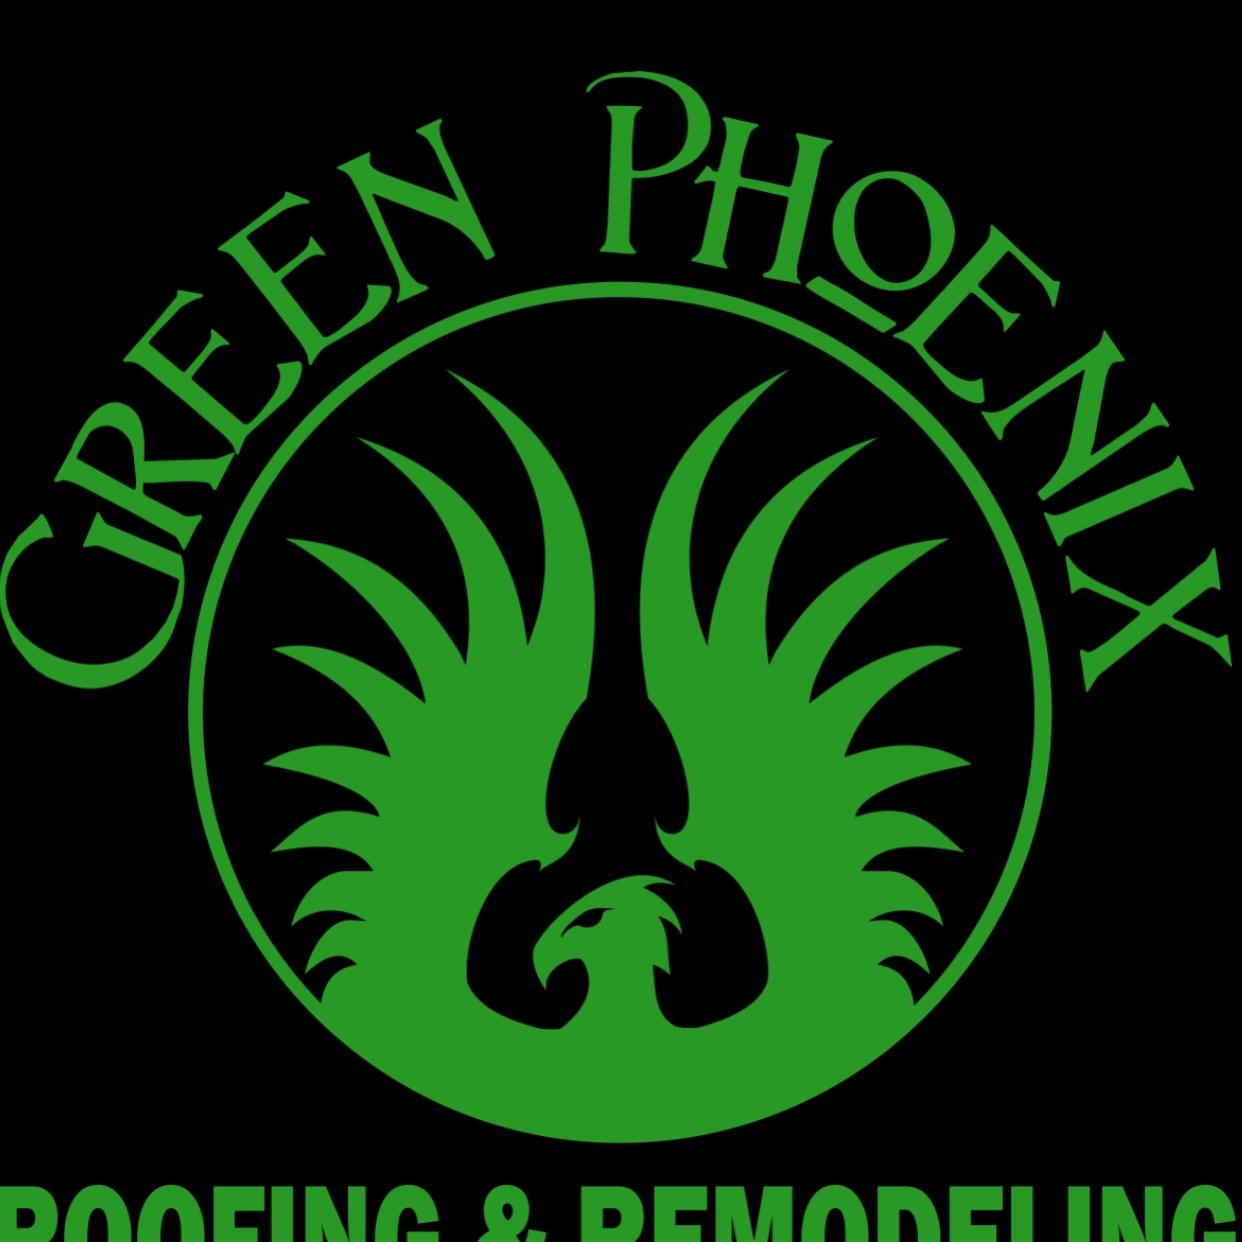 Green Phoenix Roofing & Remodeling logo